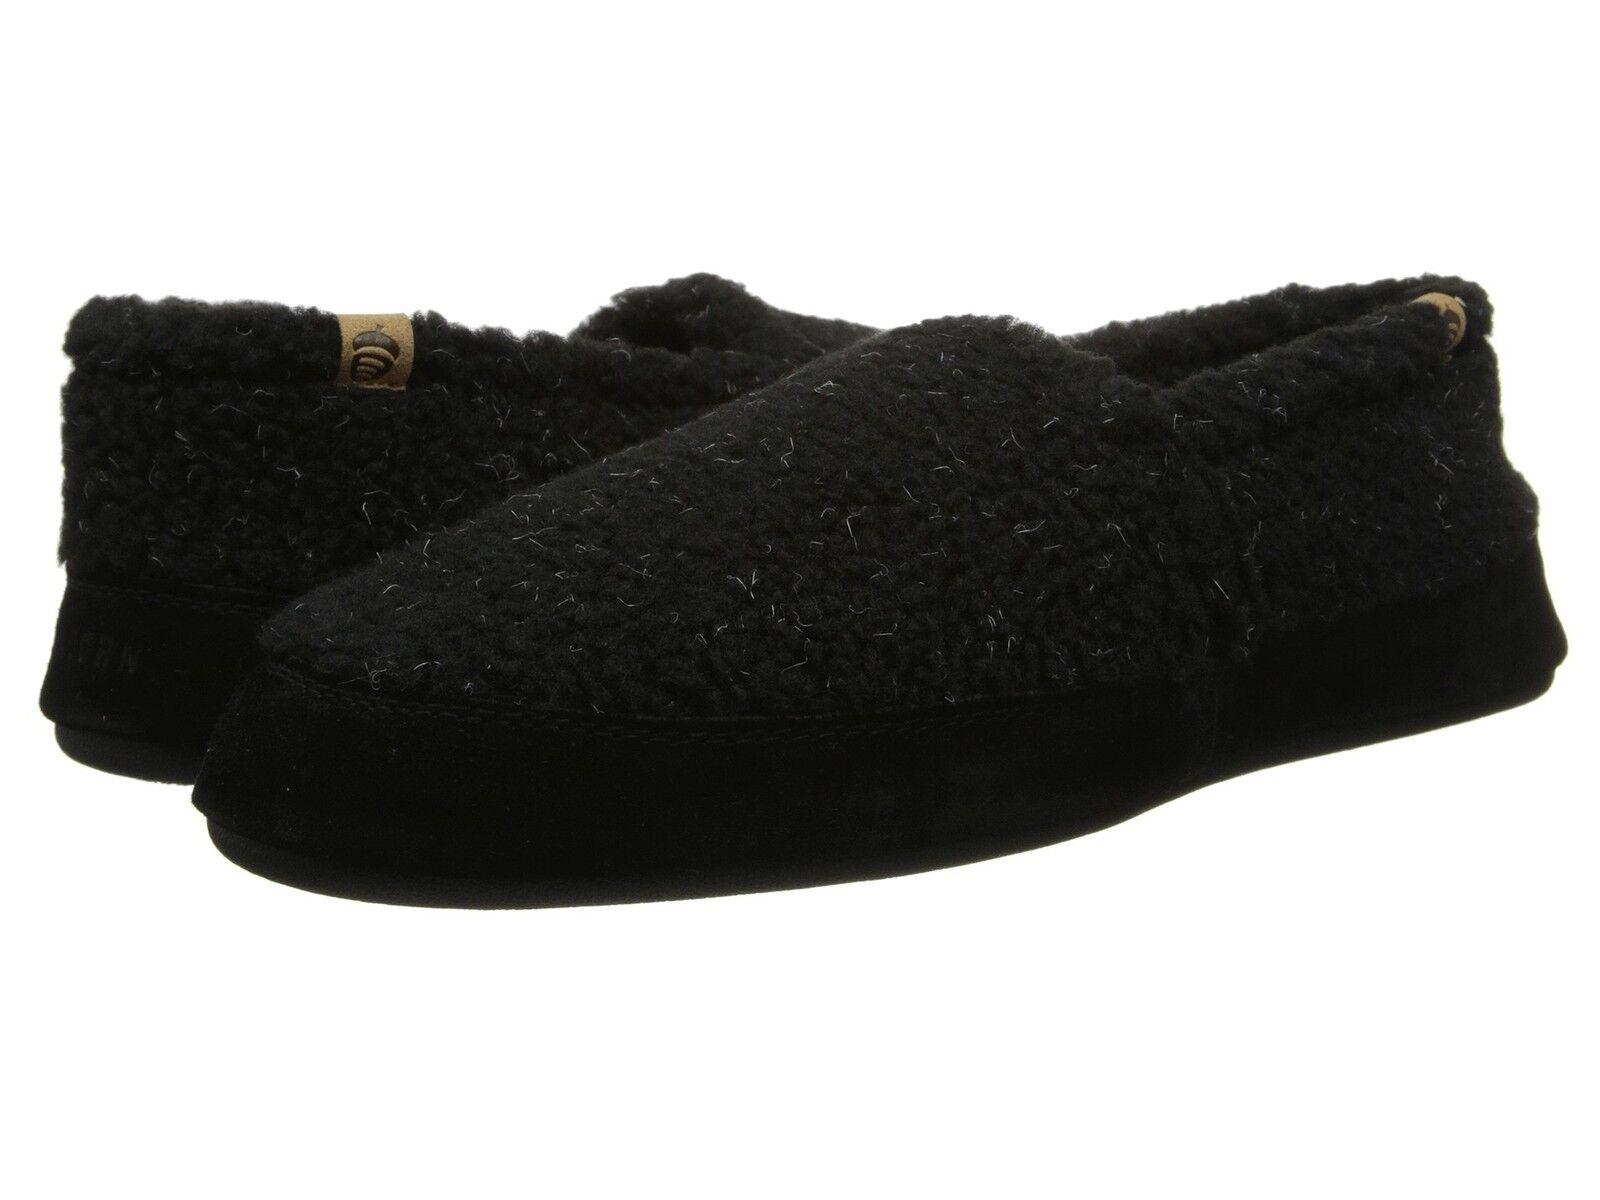 Acorn  Moc  Slipper Fleece Moccasin Black Berbe Mens  All Sizes